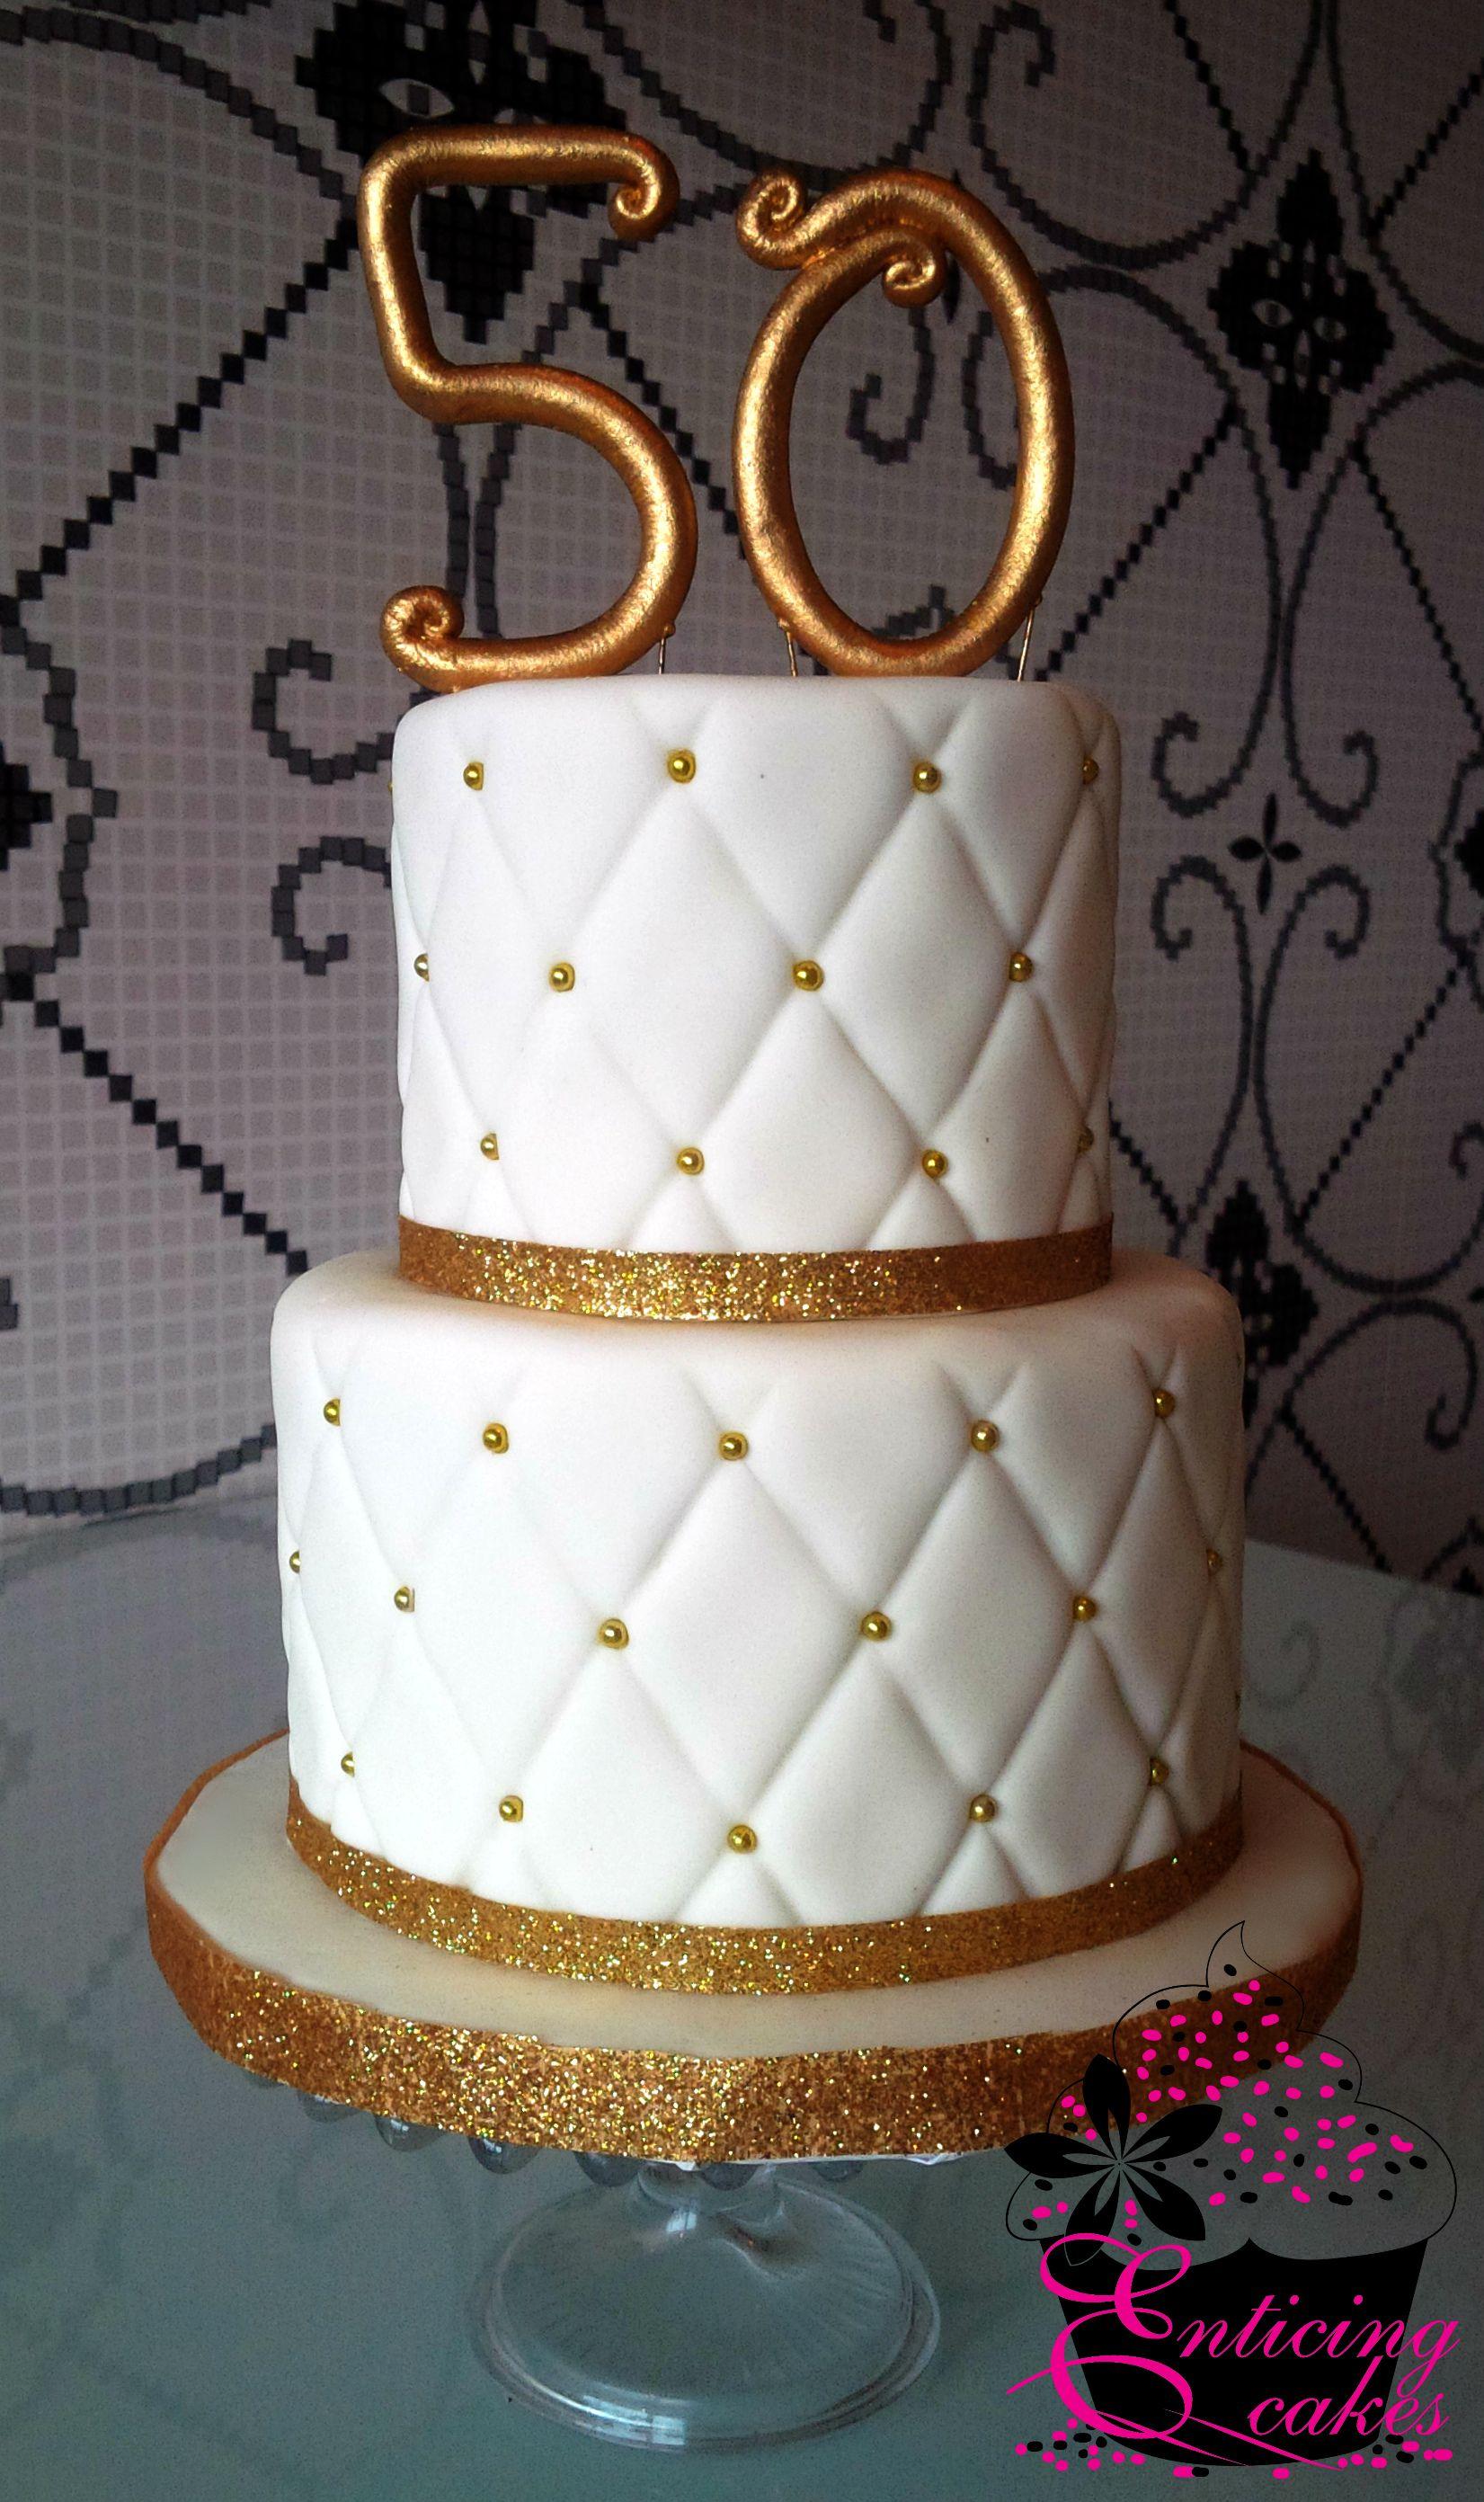 50th wedding decorations ideas  Quilted u Gold th Wedding Anniversary Cake  Cake Art Ideas